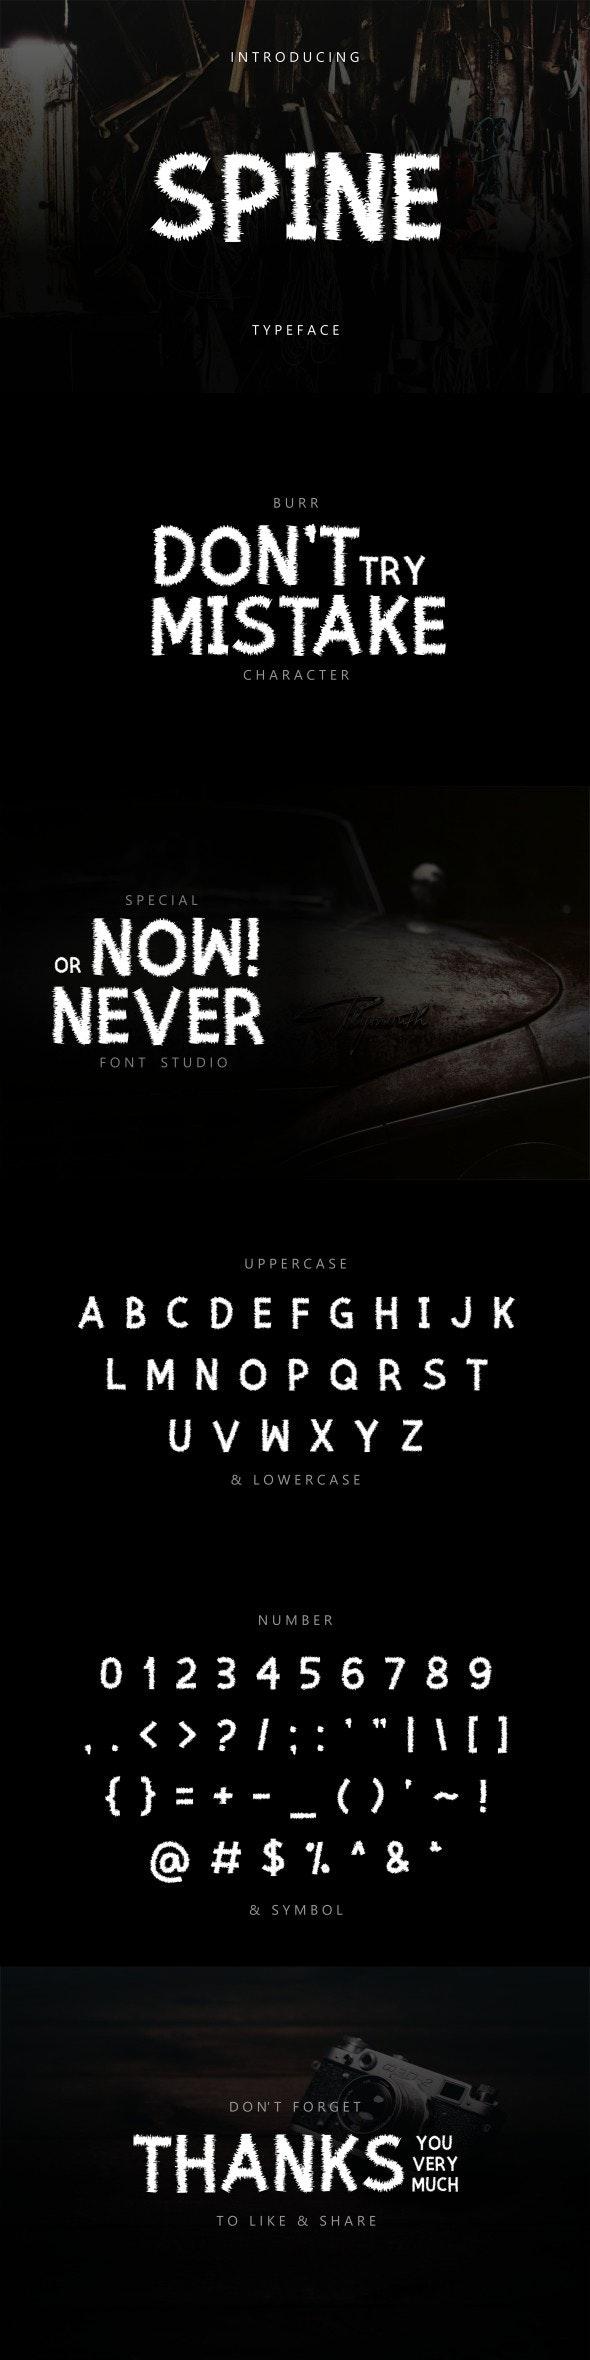 Spine Typeface Font - Sans-Serif Fonts